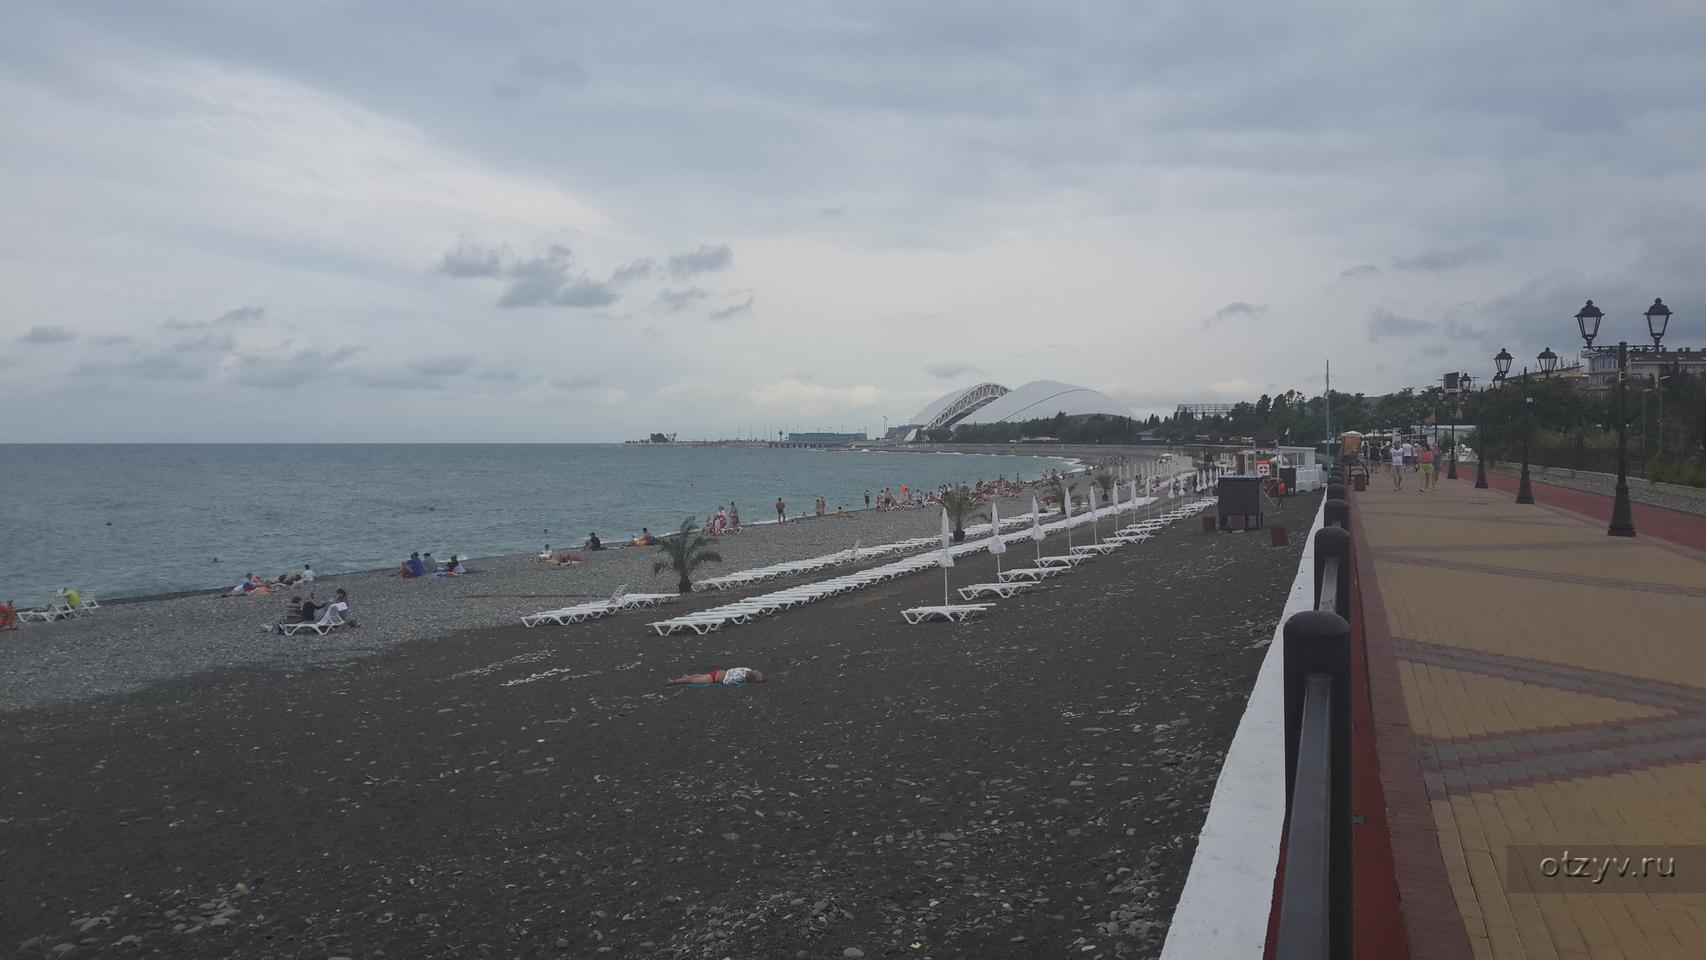 Азимут адлер фото пляжа